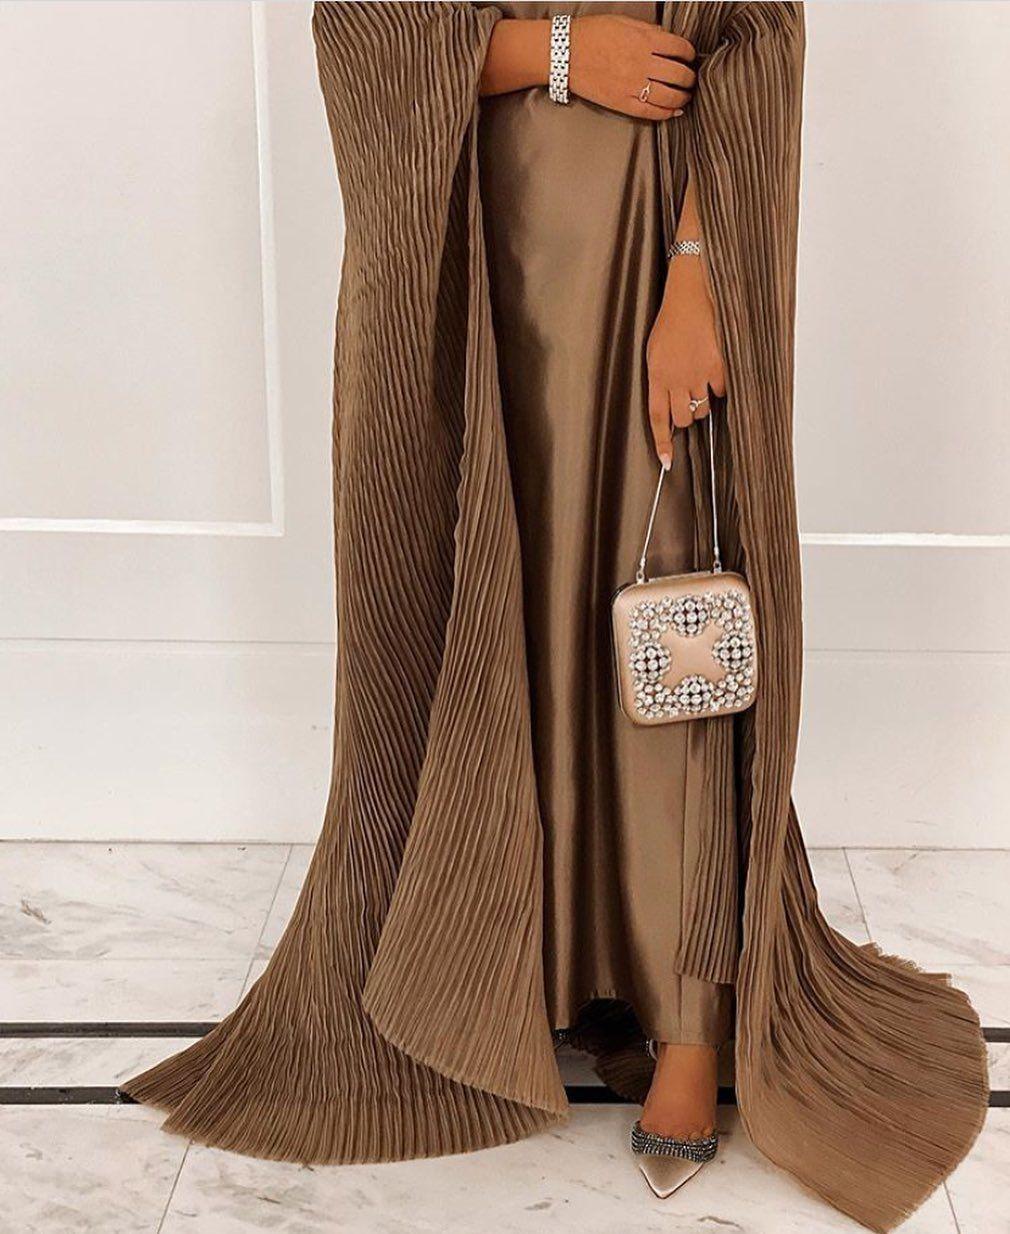 الحمدلله On Instagram Bronze Dress Gown Fashion Fashionblogger Style Stylish Trend Details Phot Fashion Womens Fashion Fashion Blogger